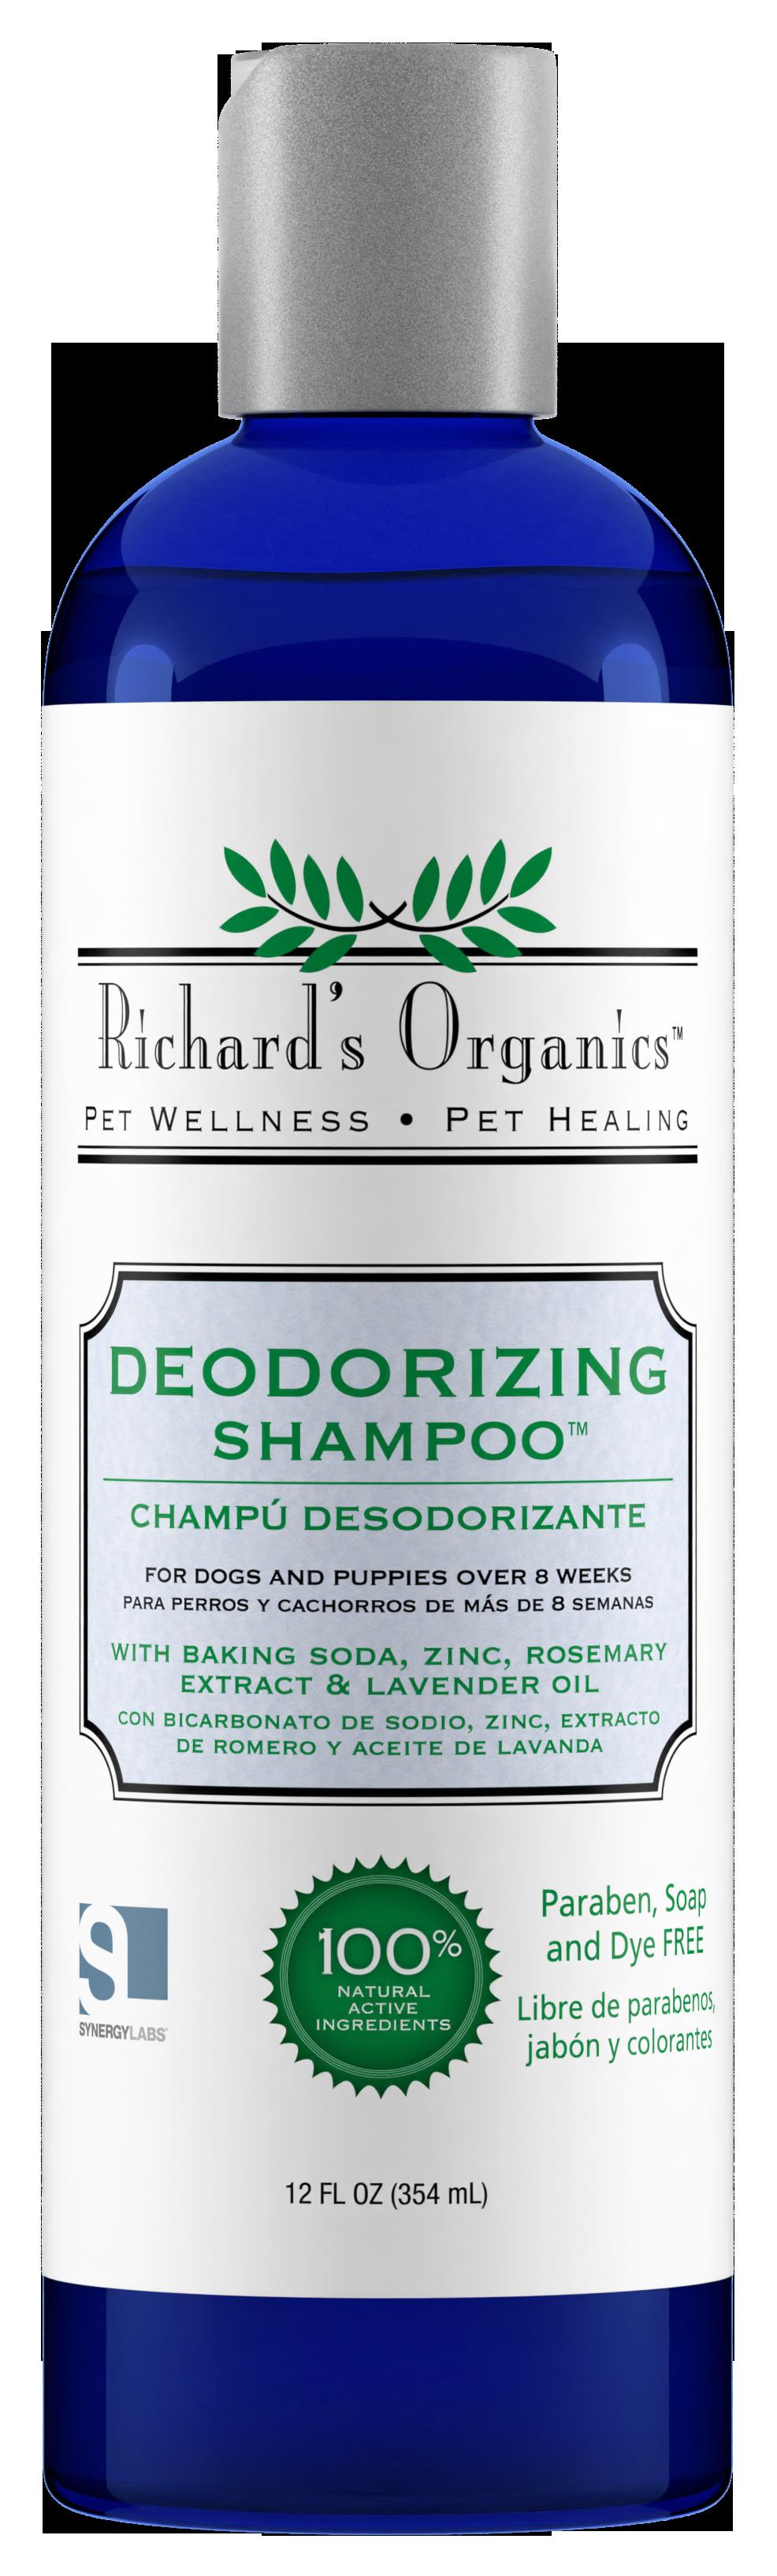 Deodorizing Shampoo